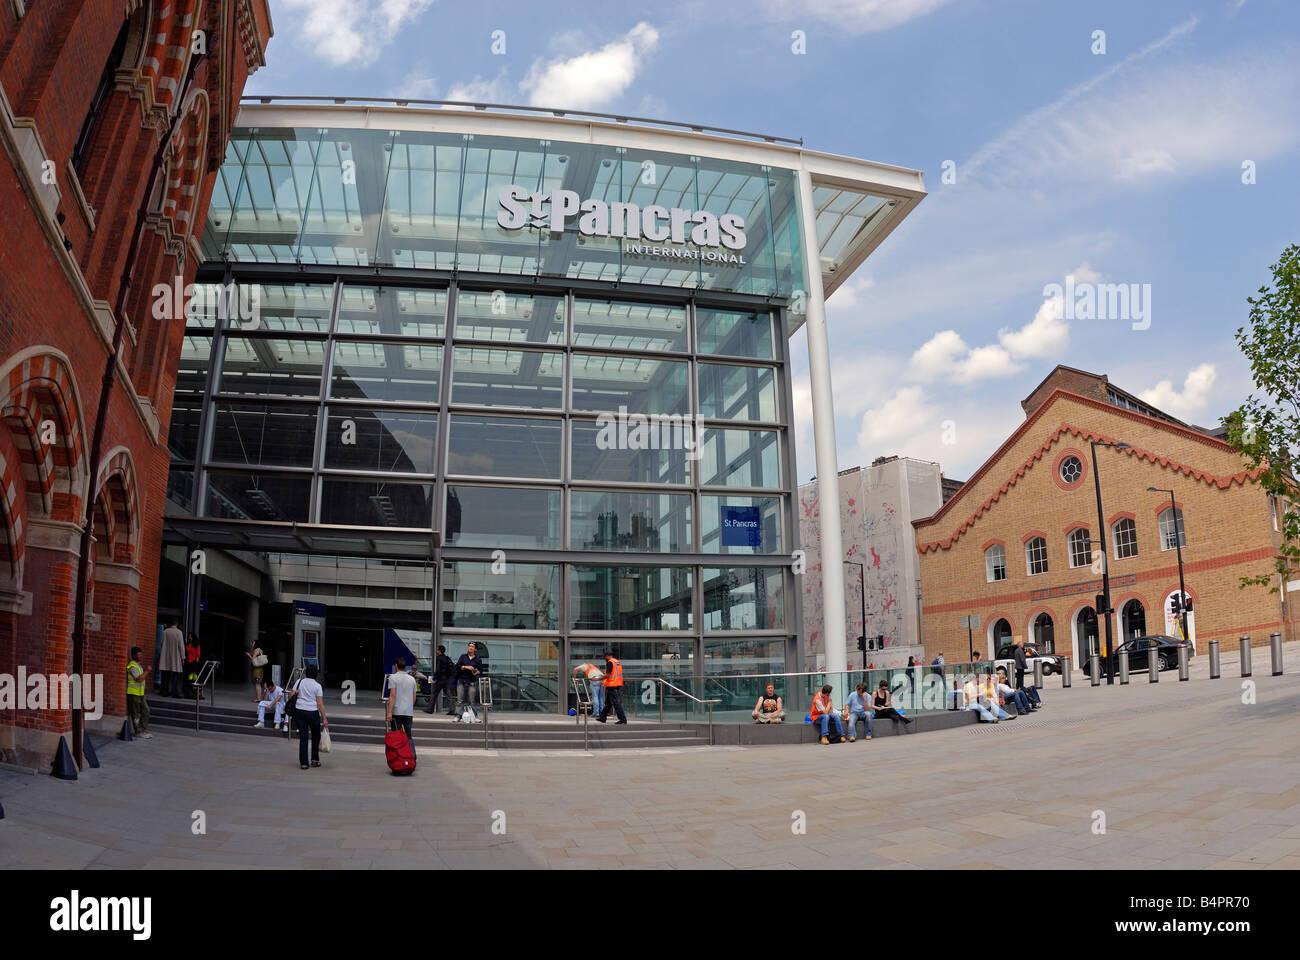 St Pancras International Railway Station, London - Stock Image